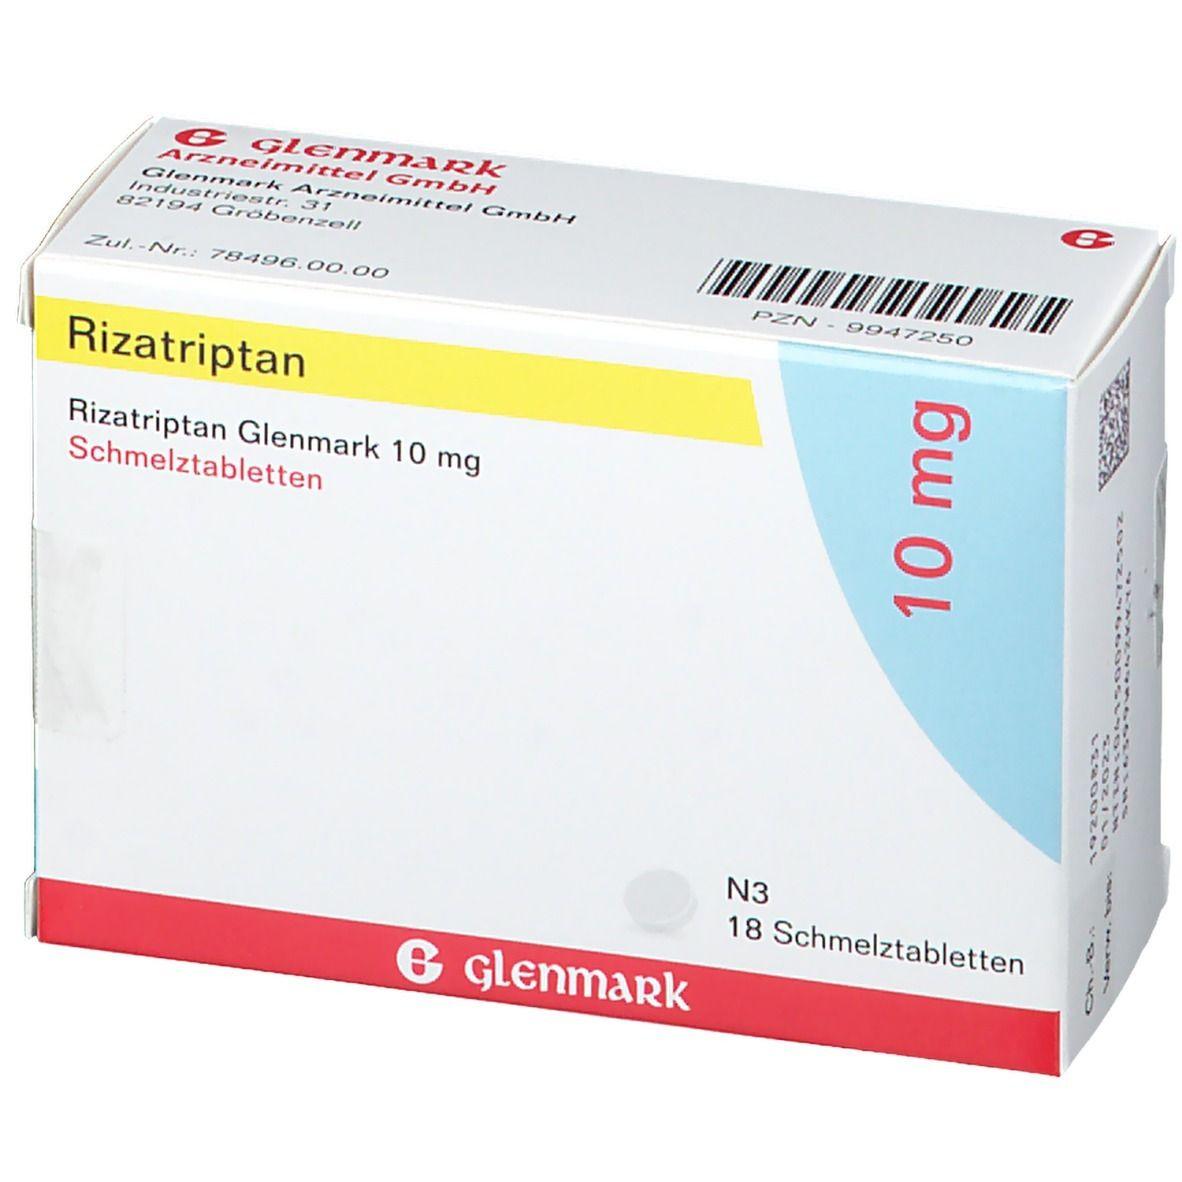 D bol 10 mg lisinopril